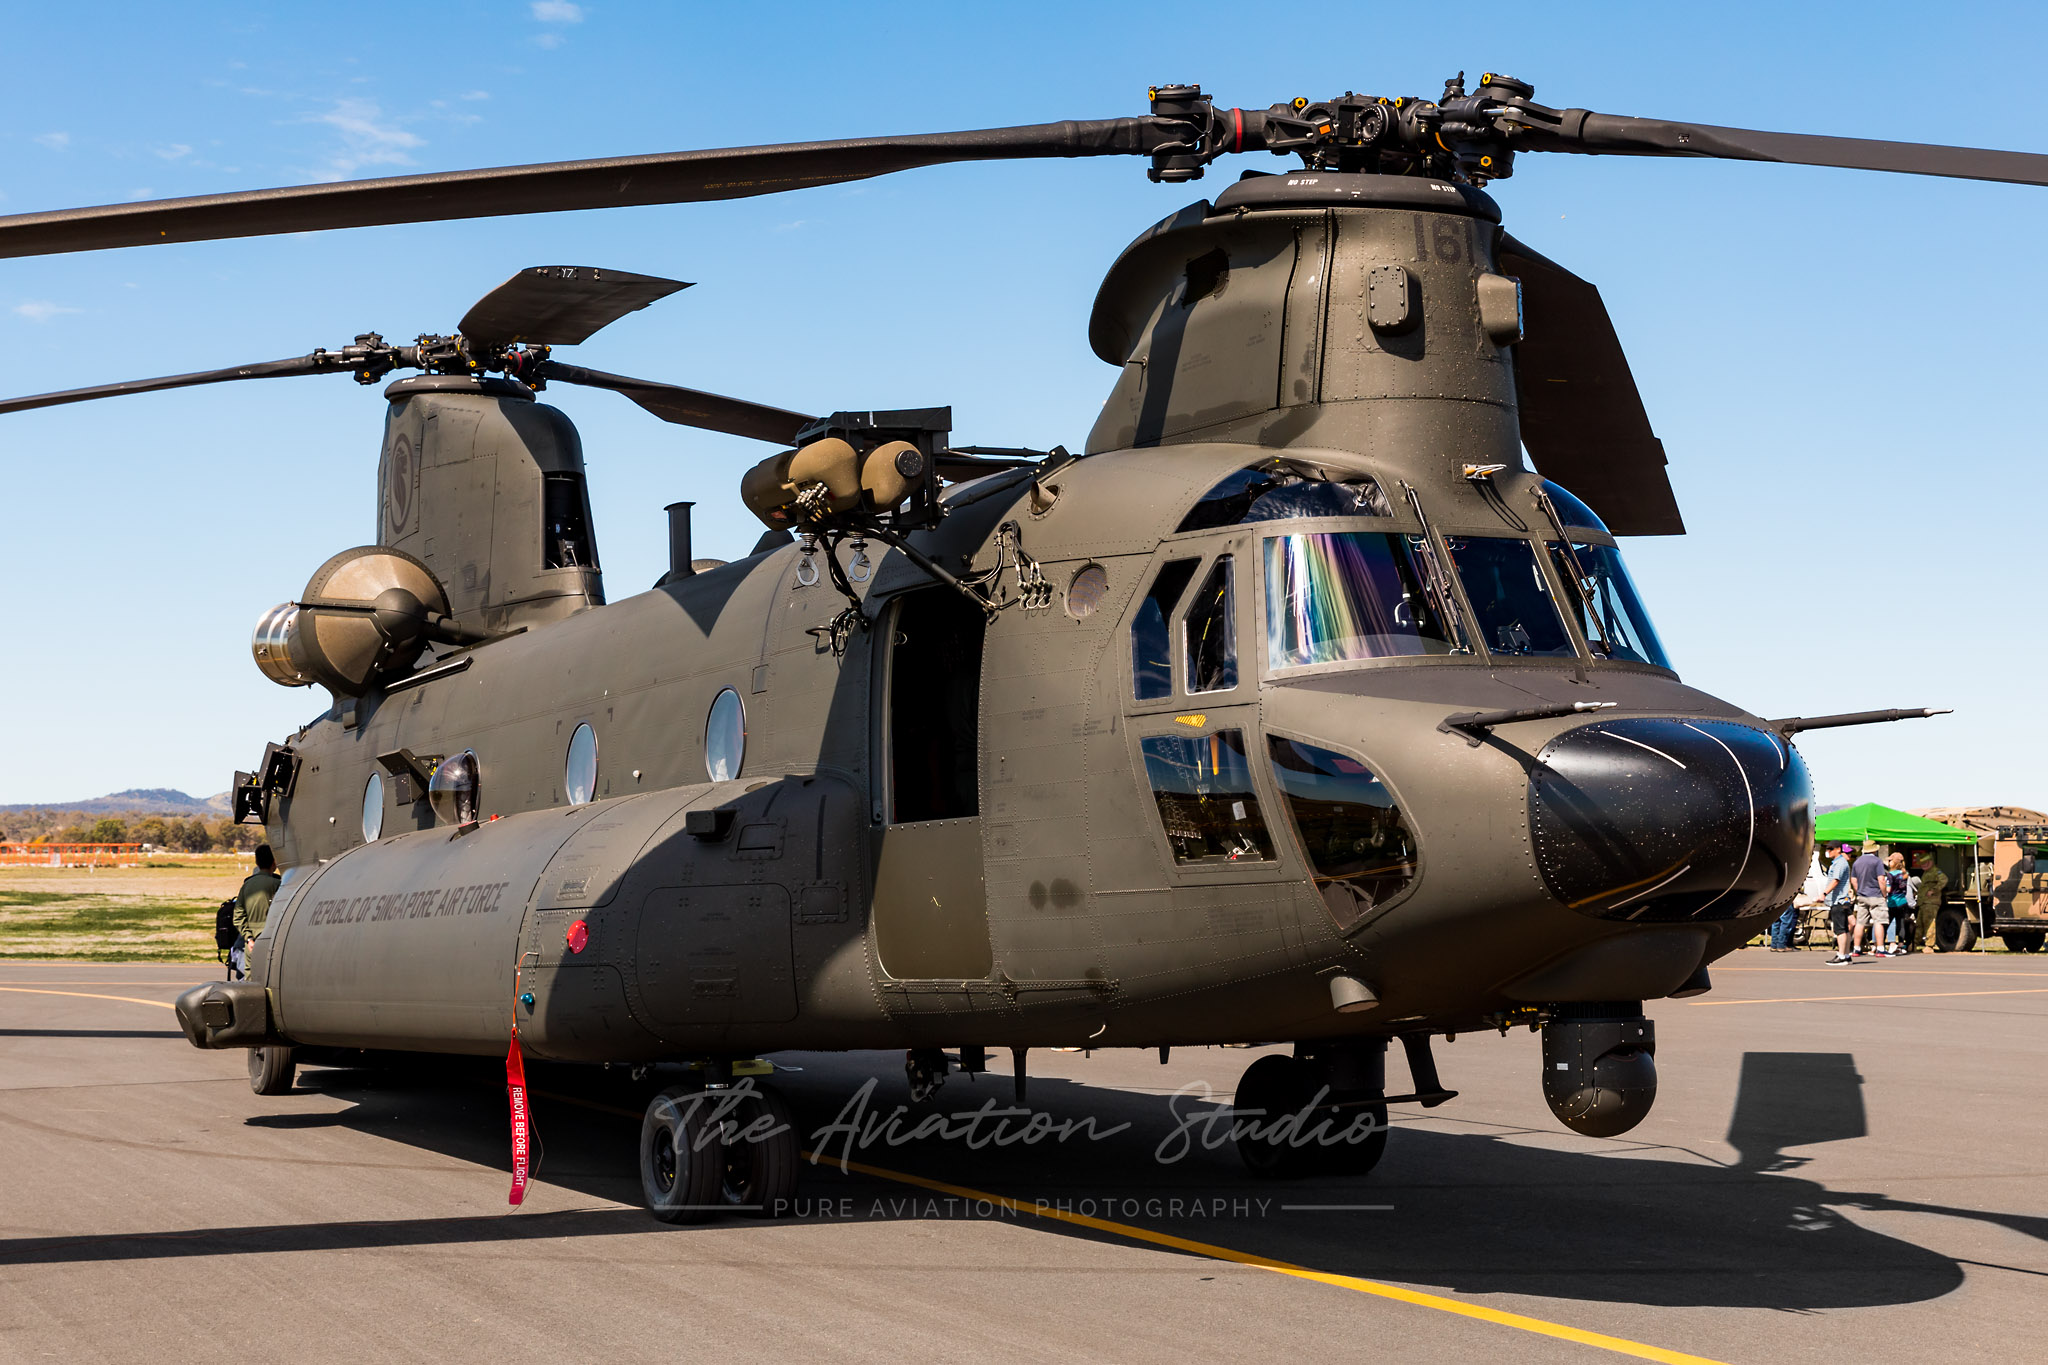 RSAF CH-47F 88161 on display at the Swartz Barracks Open Day